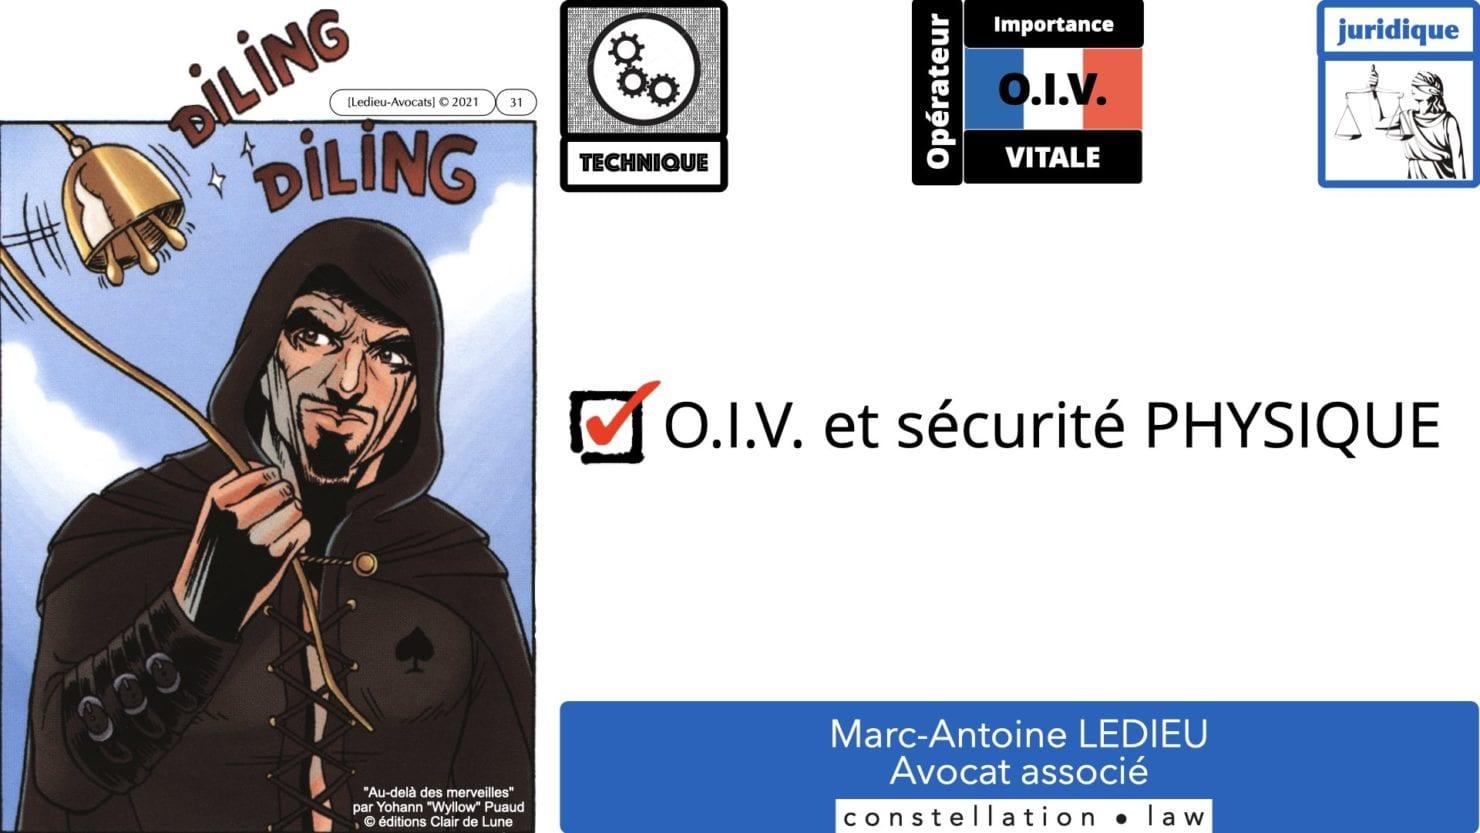 337 cyber sécurité #1 OIV OSE Critical Entities © Ledieu-avocat 15-06-2021.031